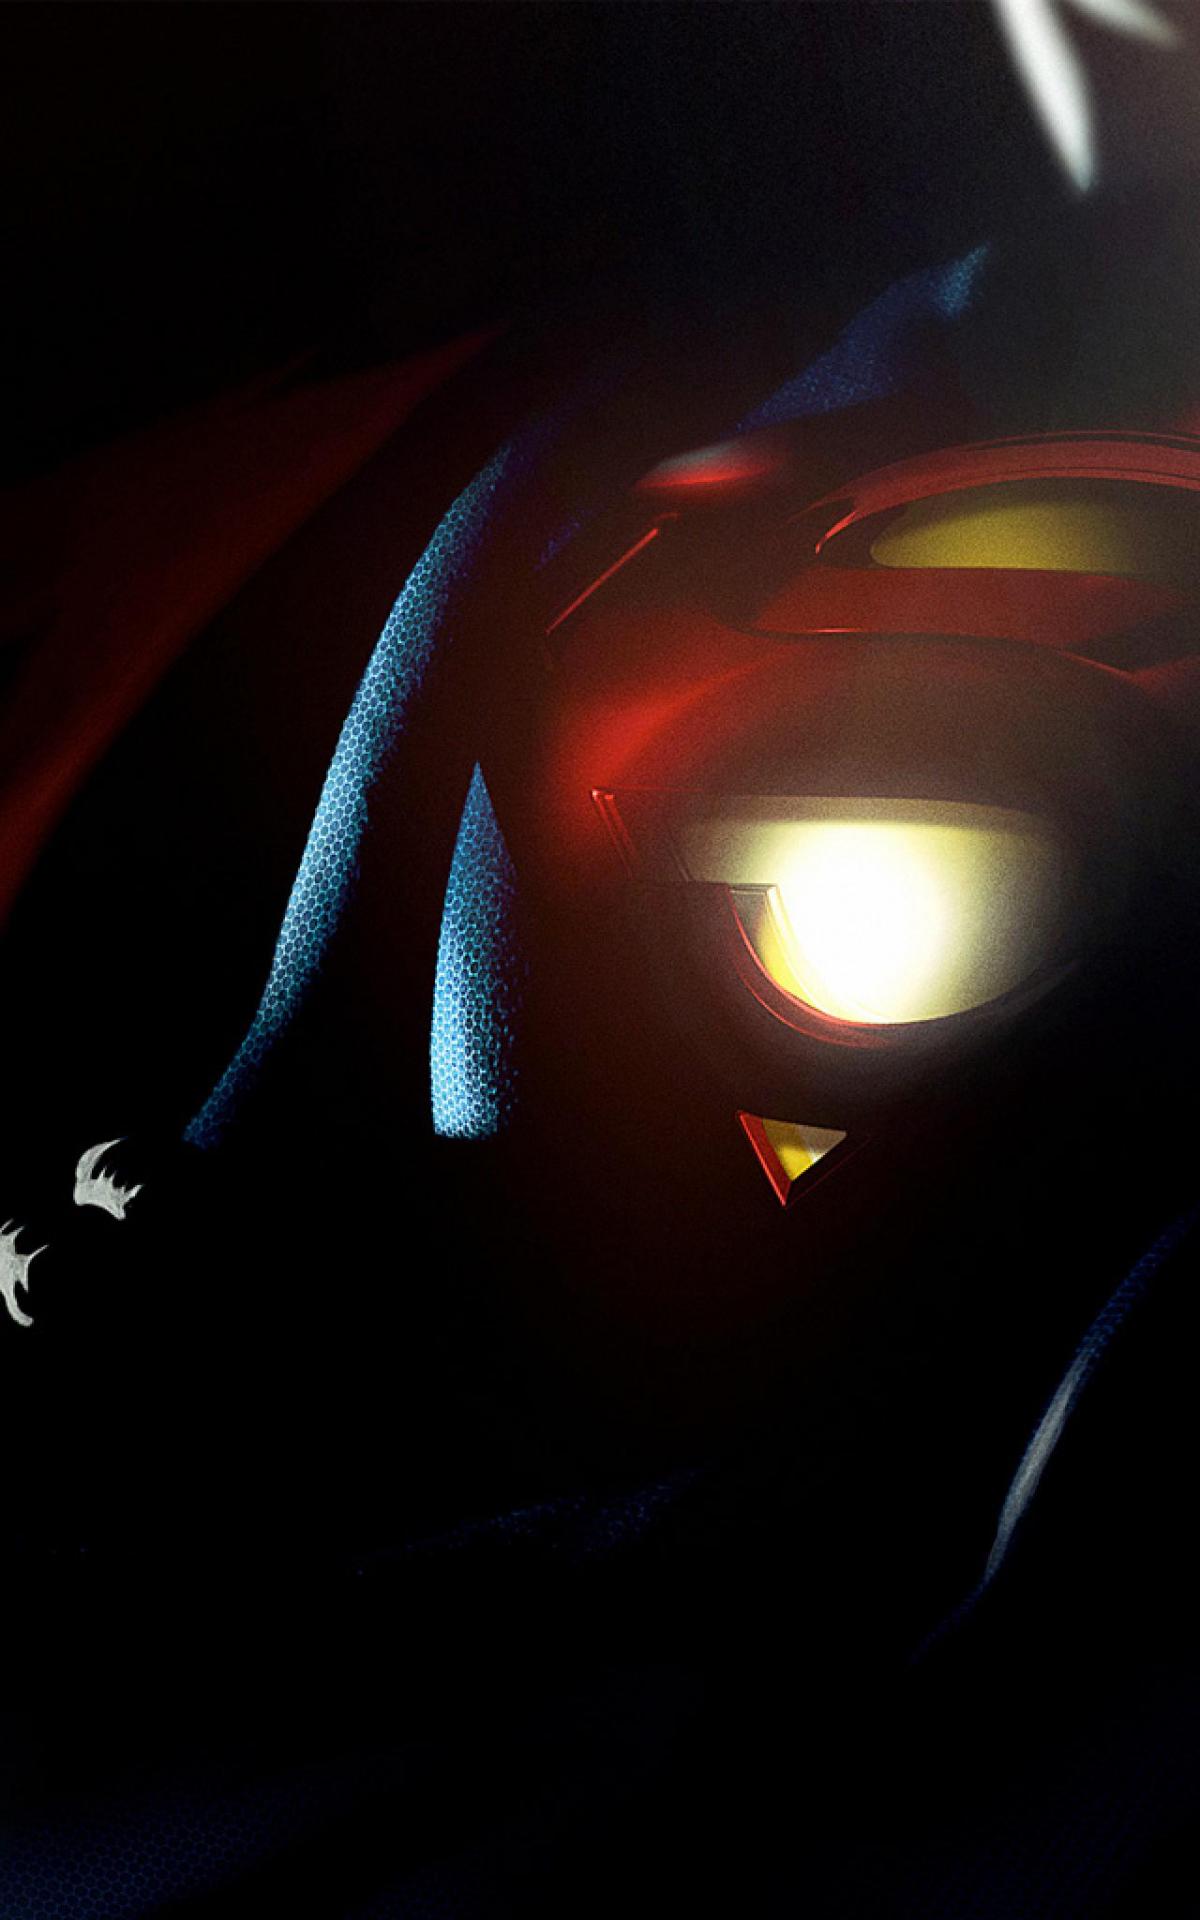 Free Download Moviestv Superman Man Of Steel Ipad Iphone Hd